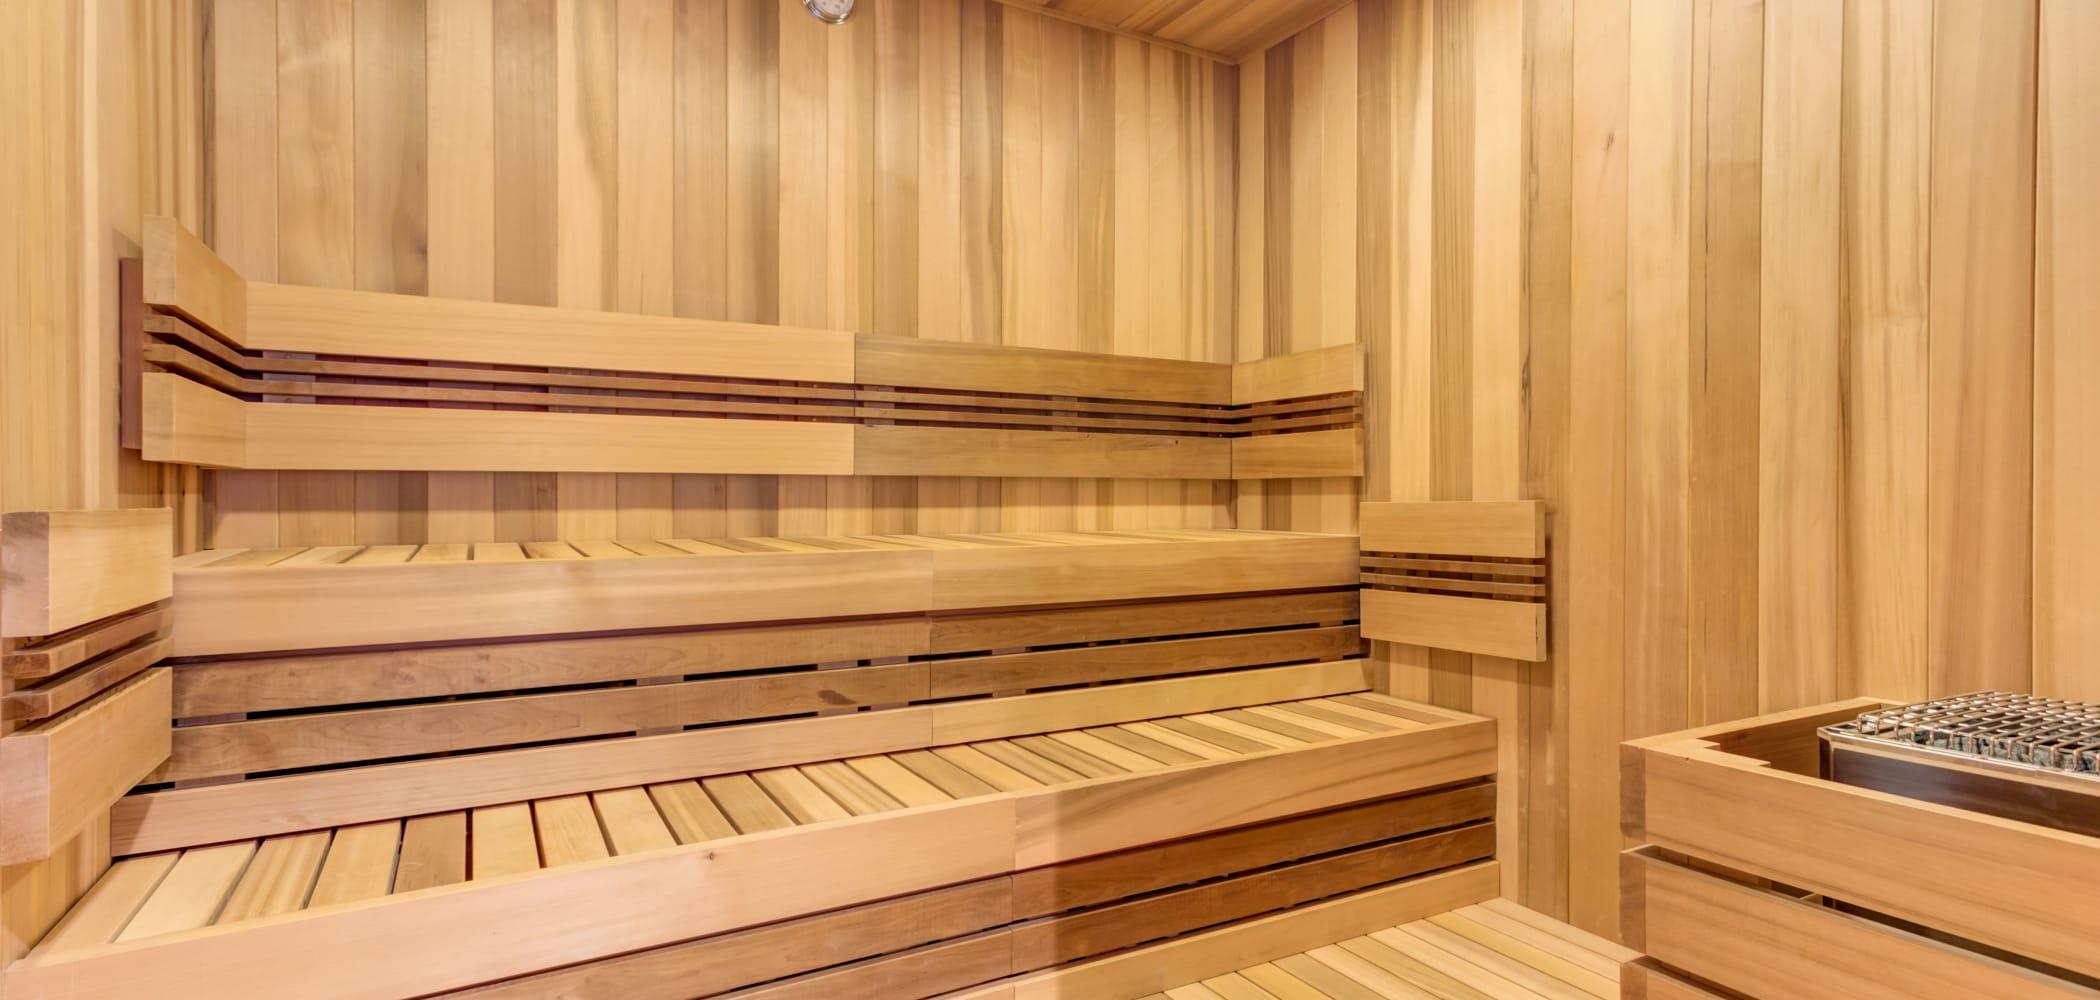 Sauna at The Link Evanston in Evanston, Illinois